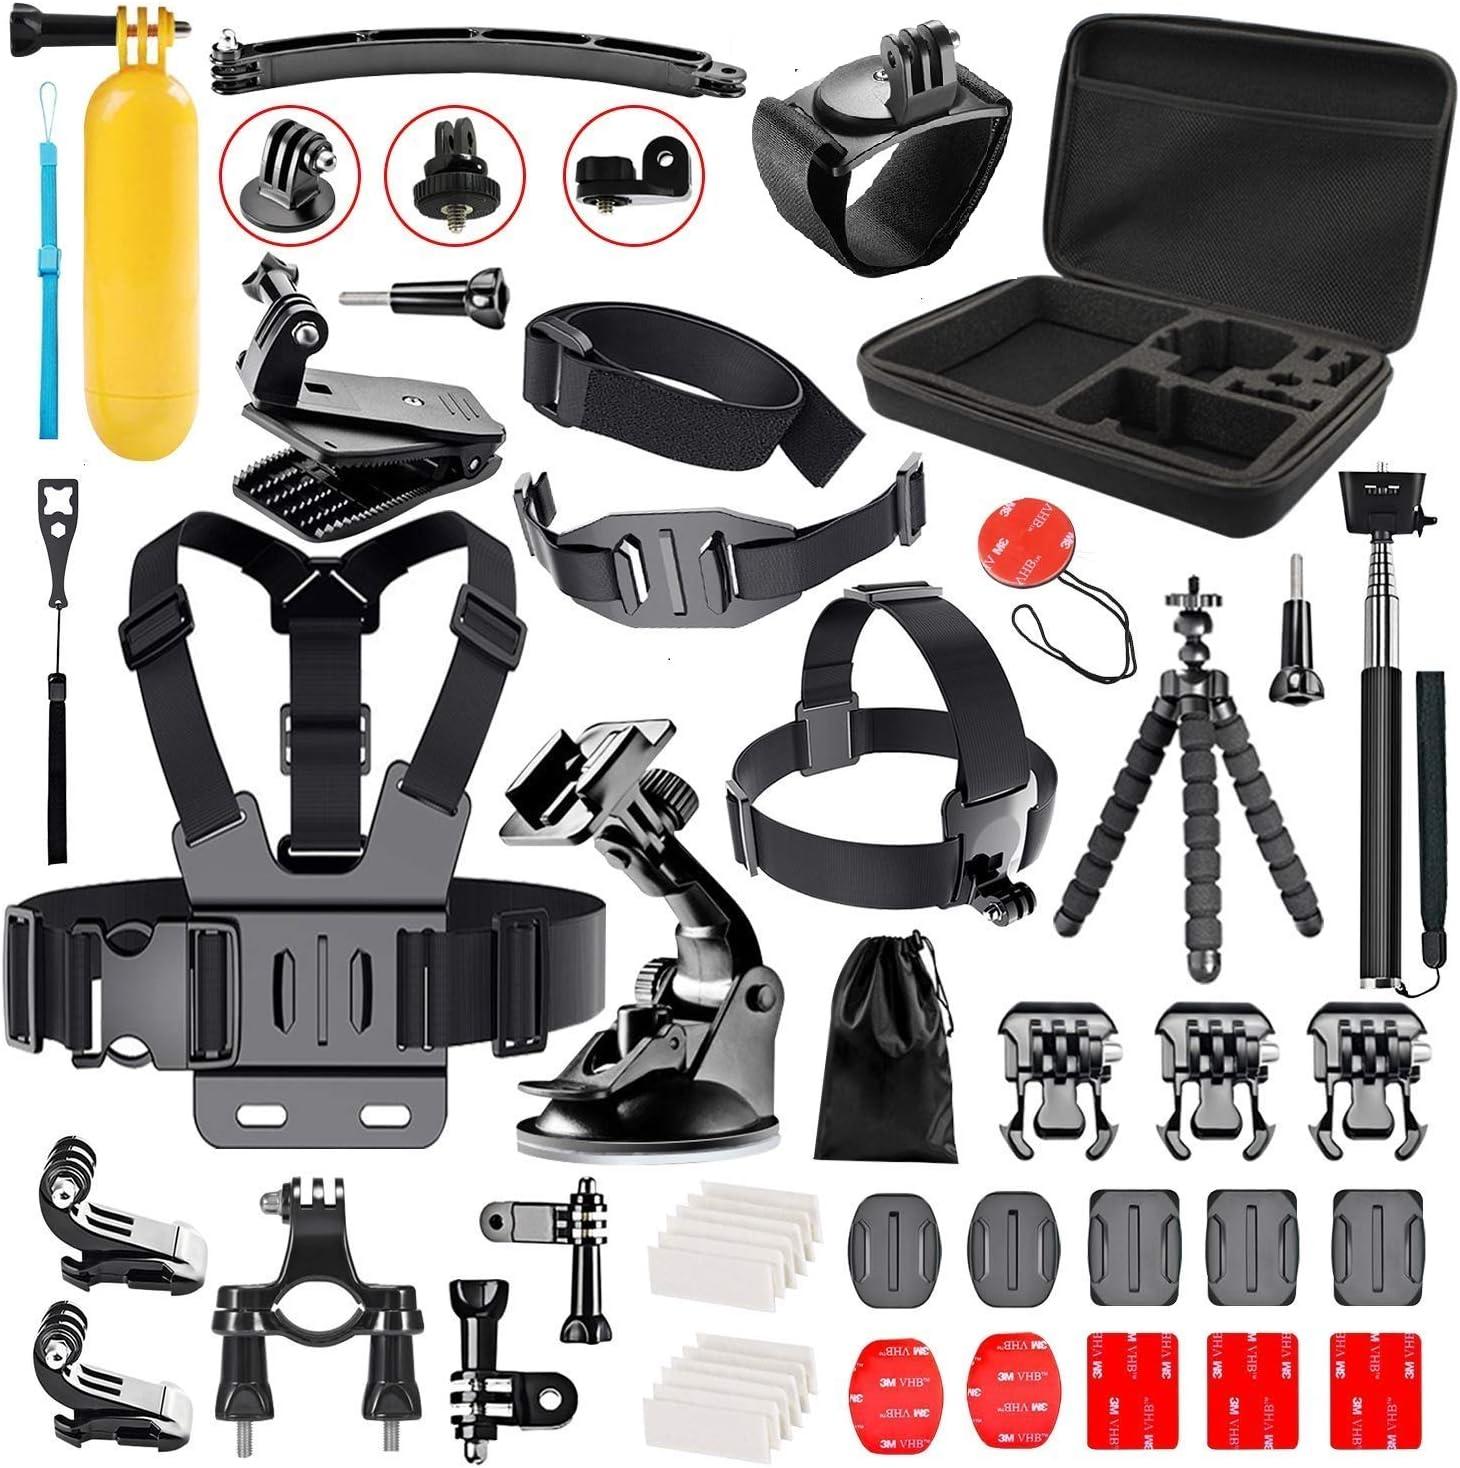 Helmet Extension Long-lasting Arm Mount AccessoriesKits for Gopro Hero 5 4